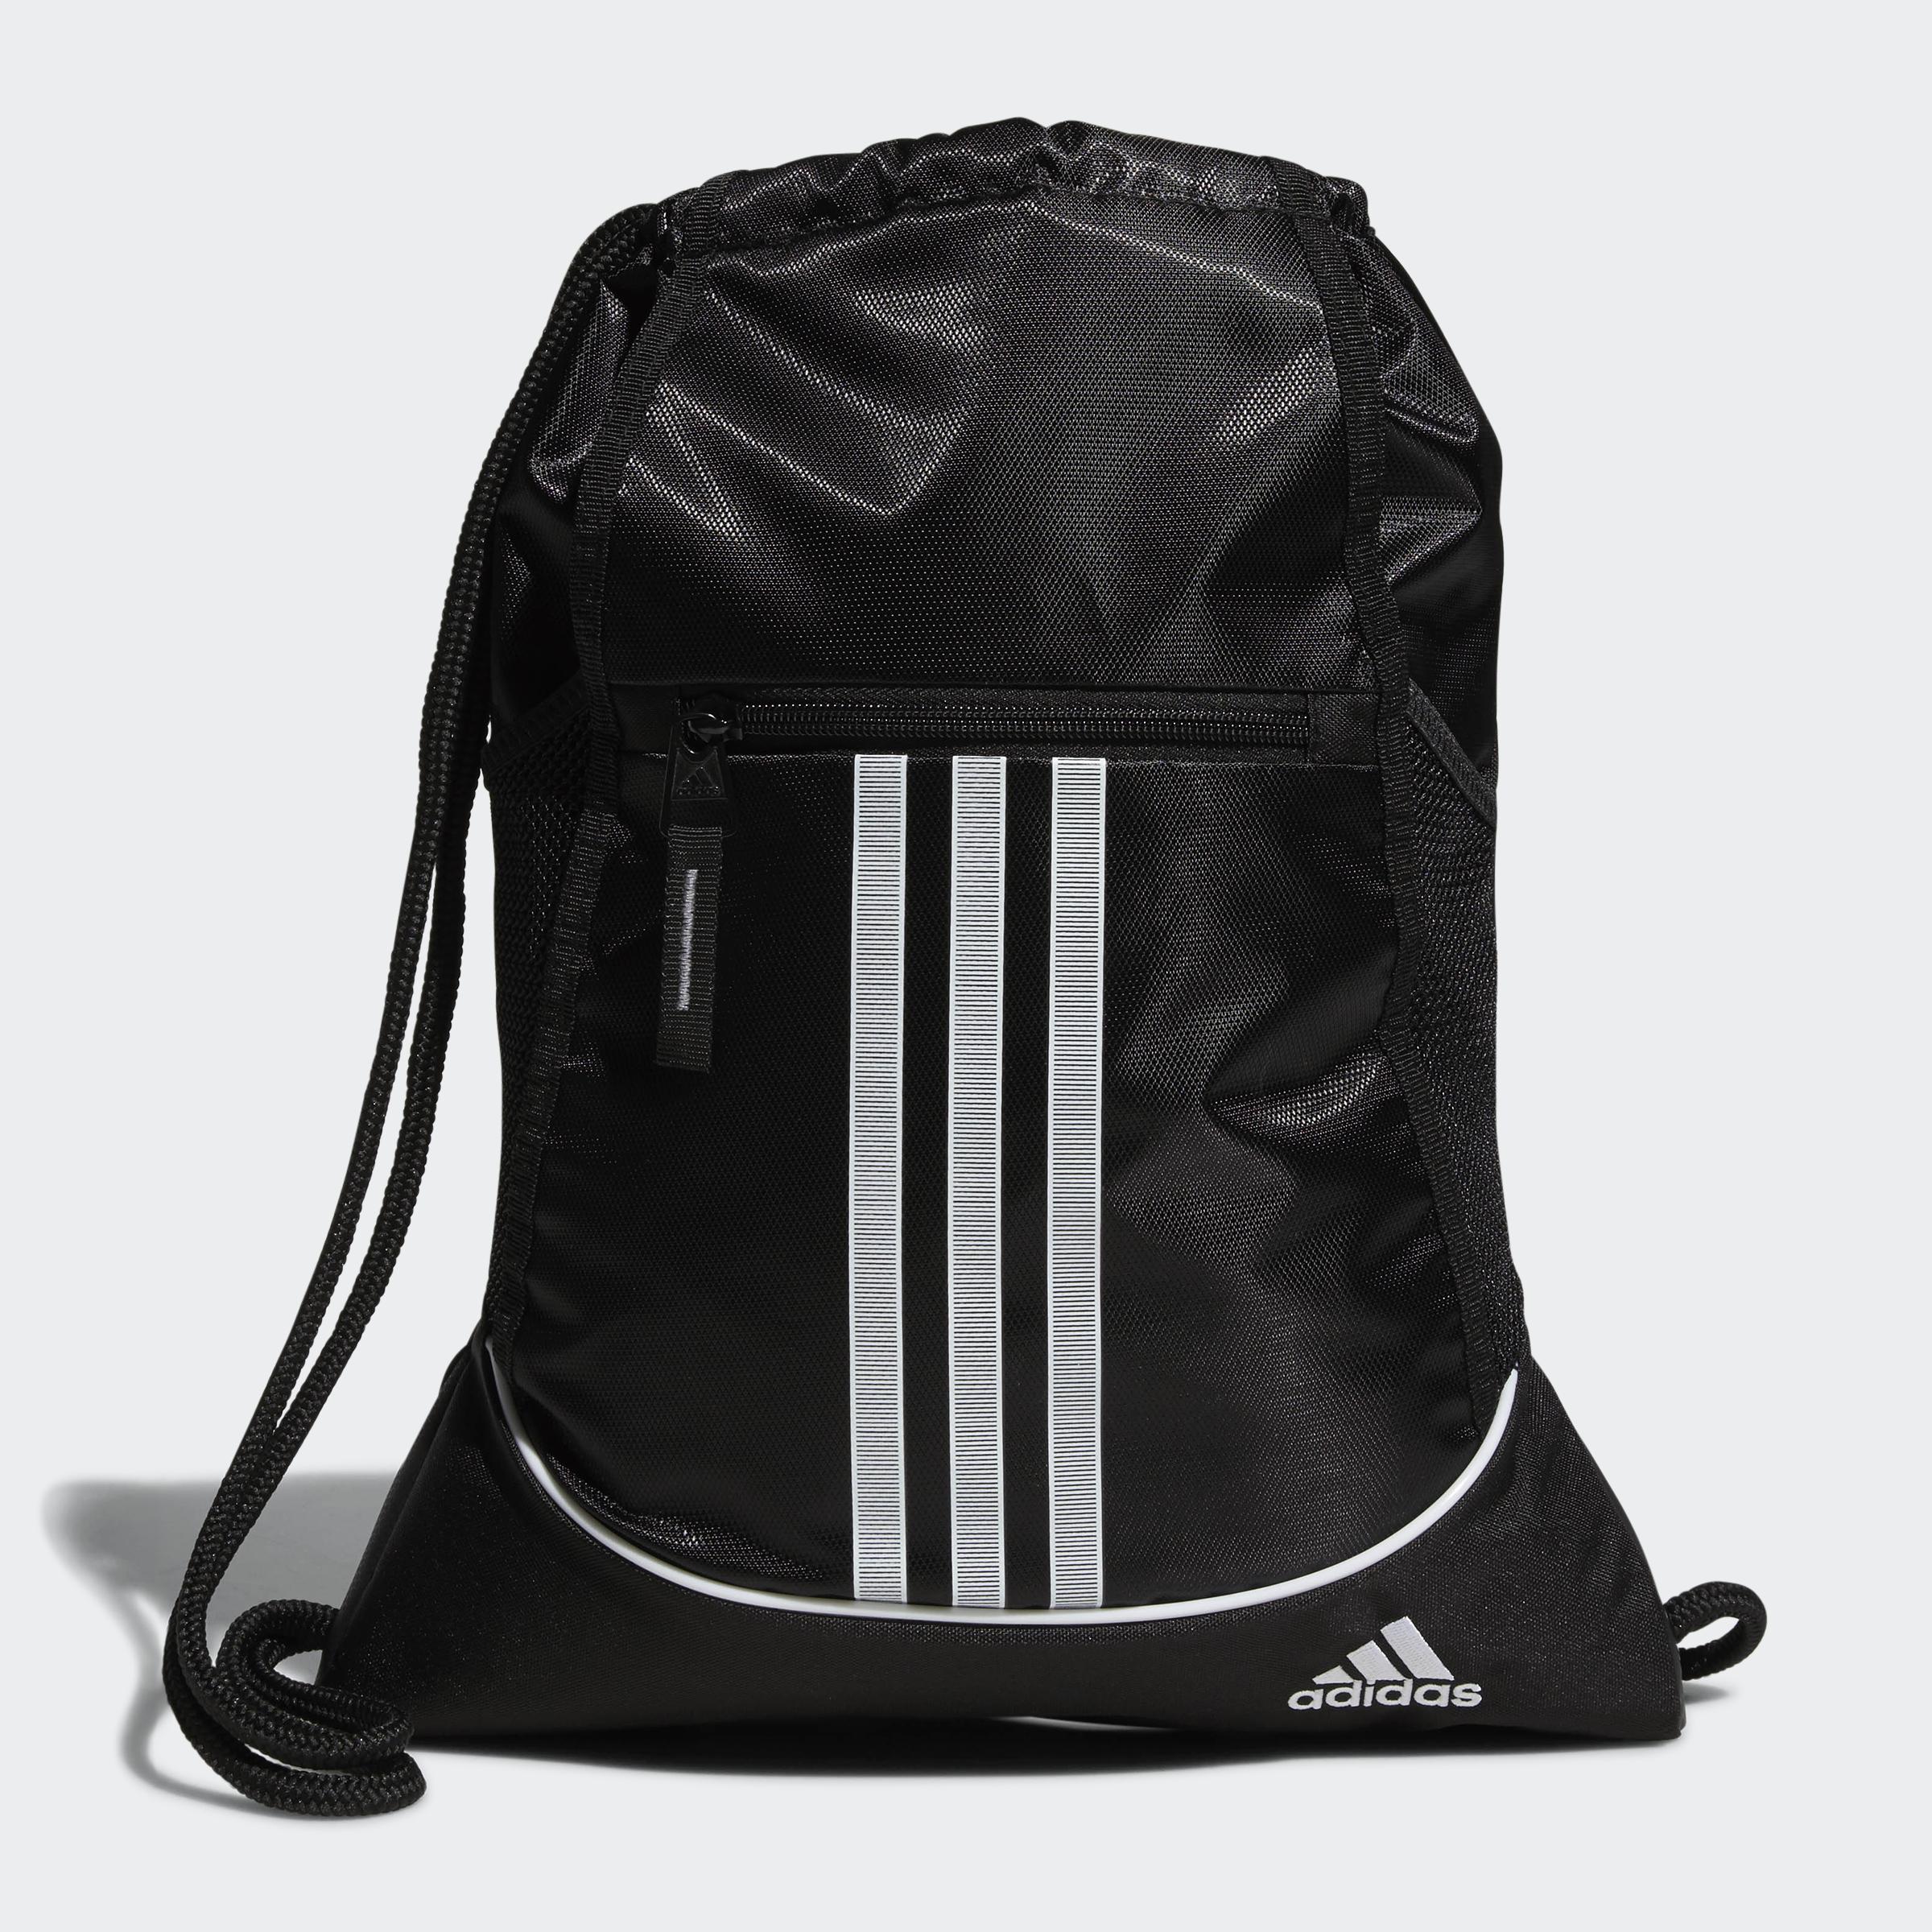 adidas-Lightning-Sackpack-Bags thumbnail 17